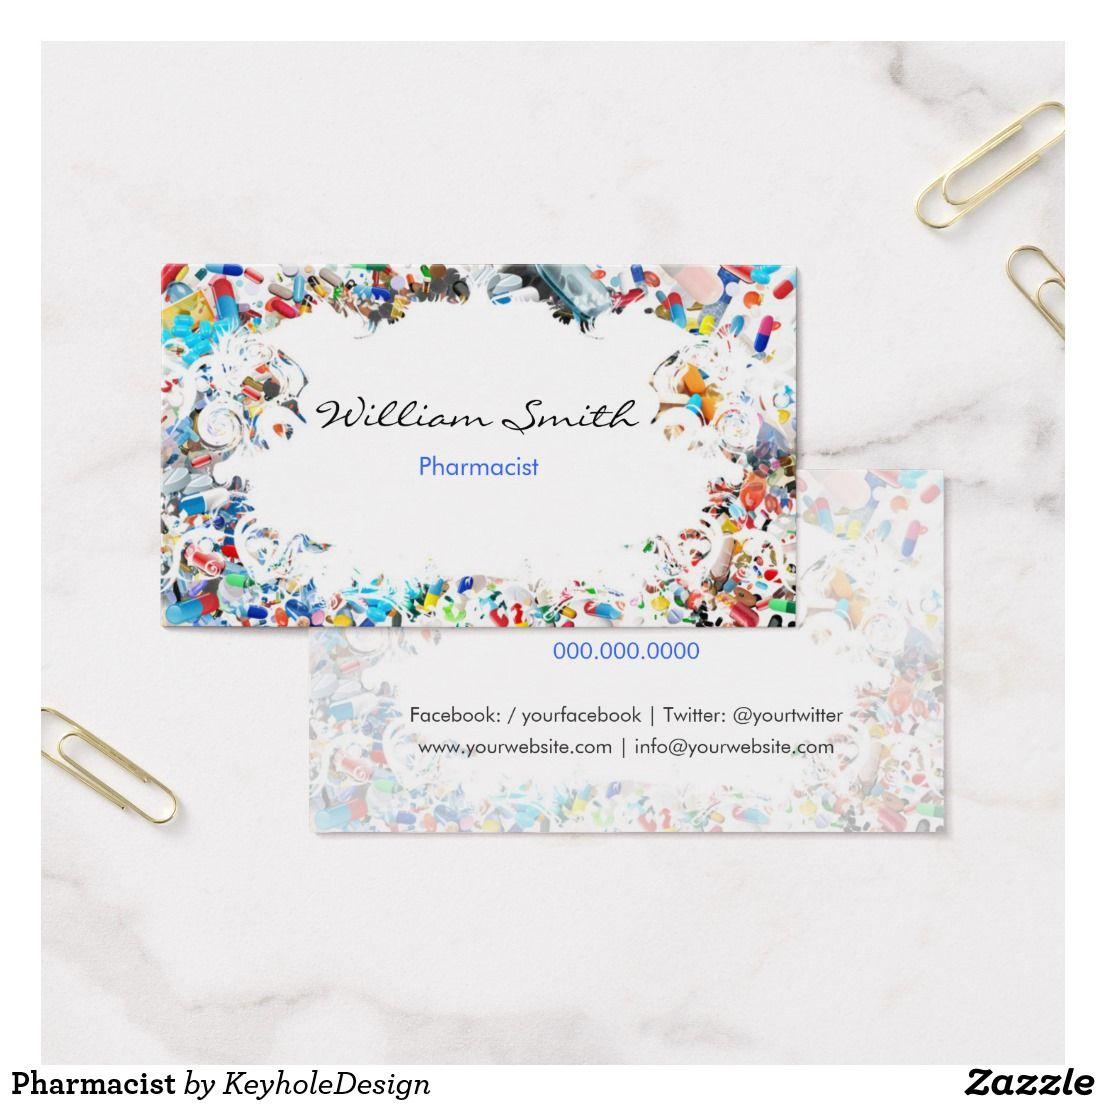 Pharmacist Business Card | Pinterest | Pharmacists, Business cards ...